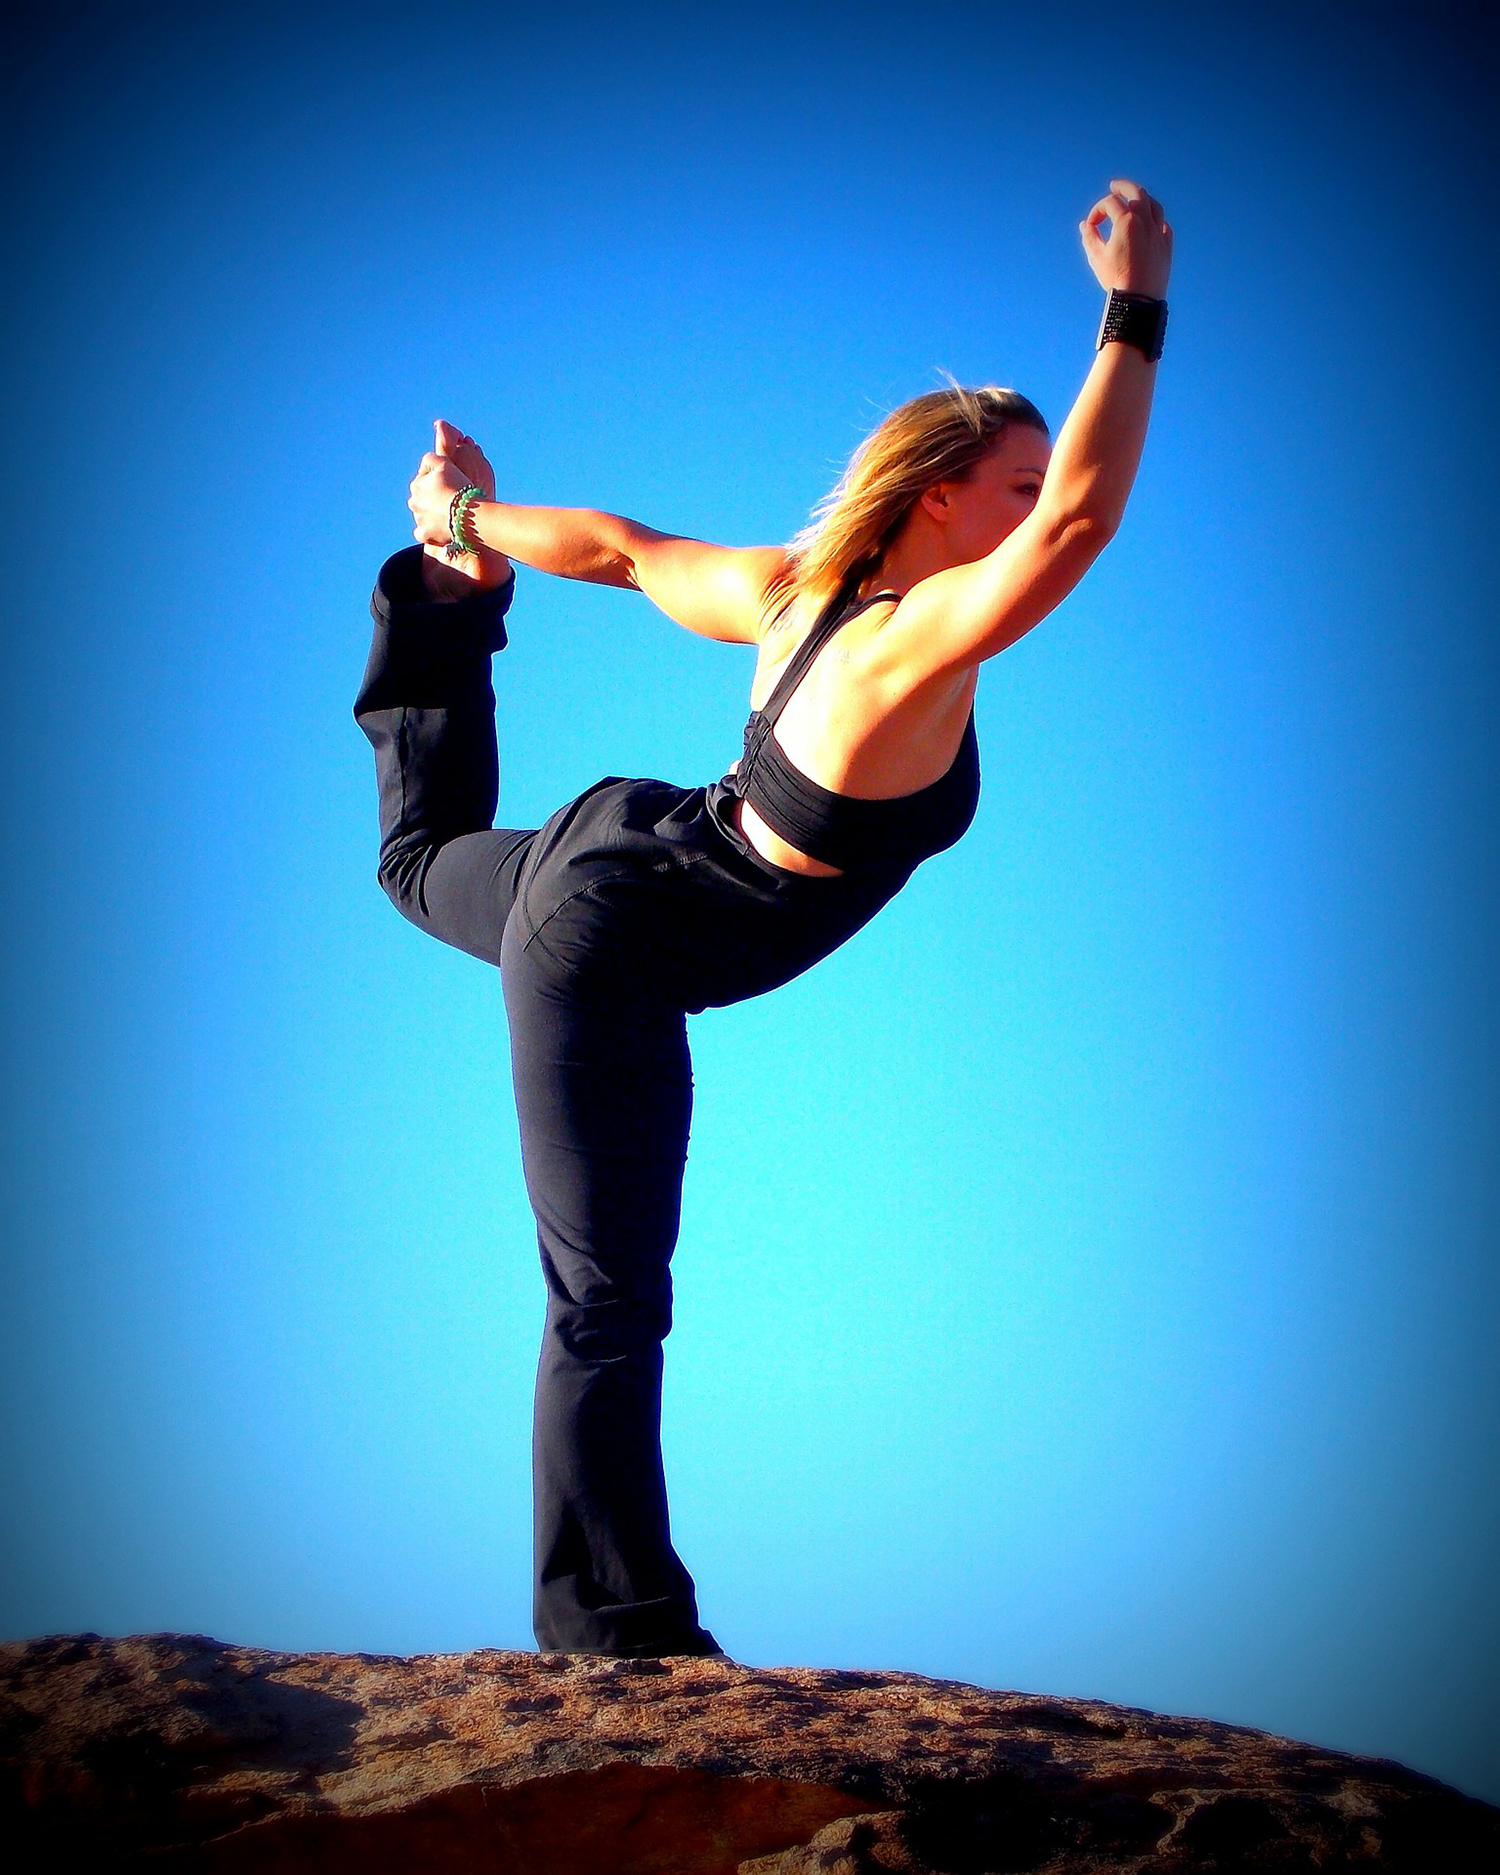 Healthy Woman Doing Yoga Outdoors. Balancing Dancer's Pose